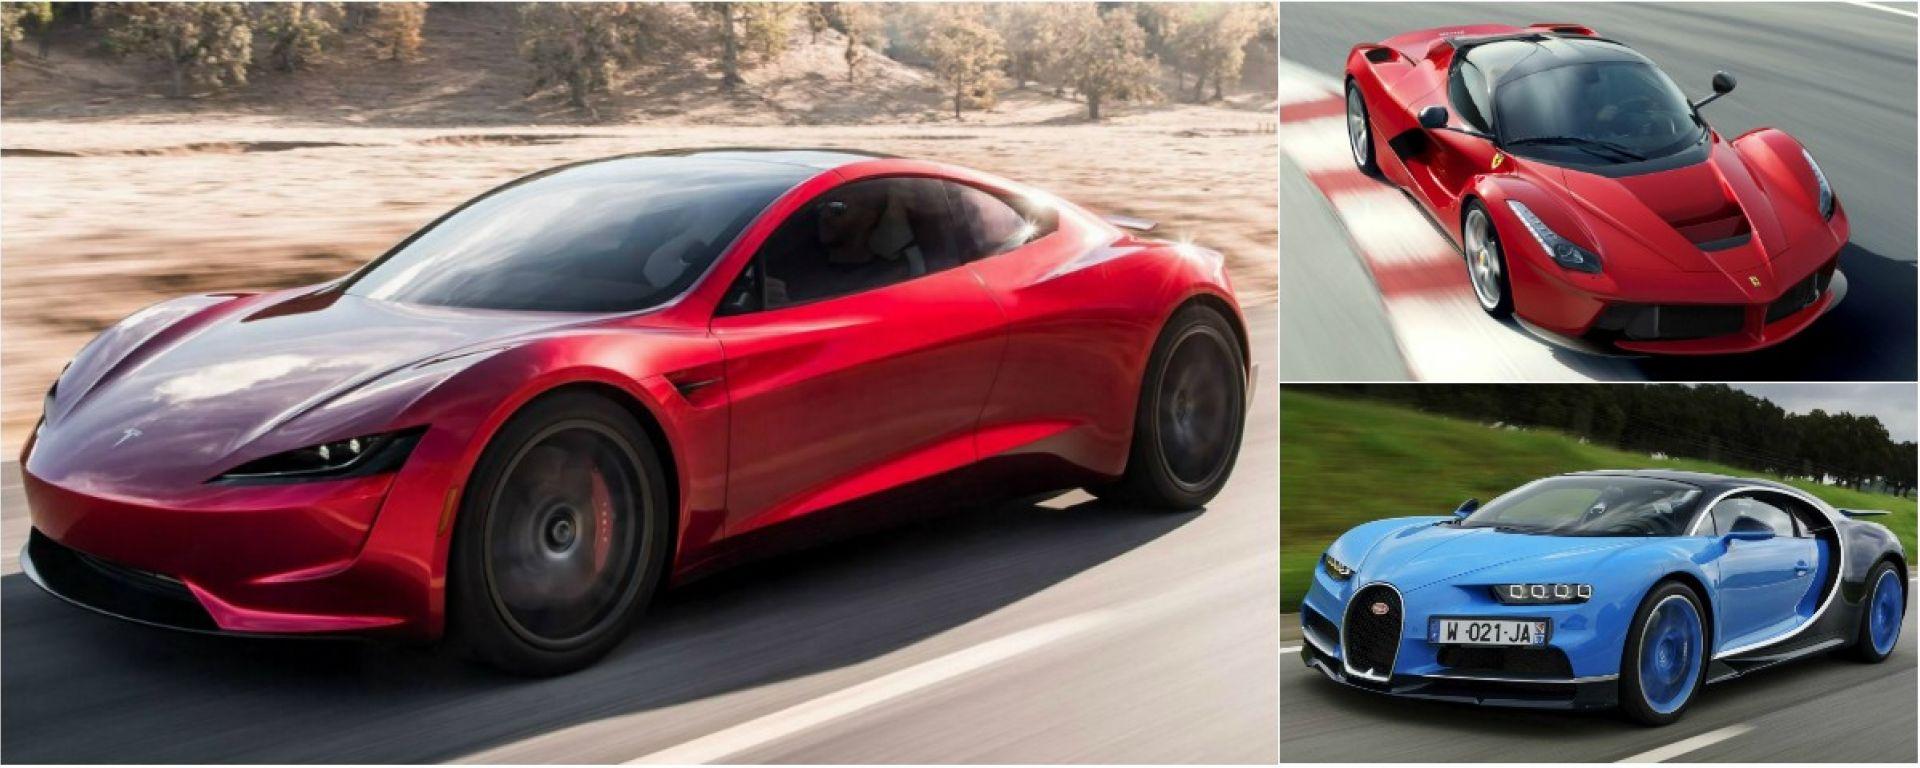 Tesla Roadster 2 vs tutti: la drag race virtuale